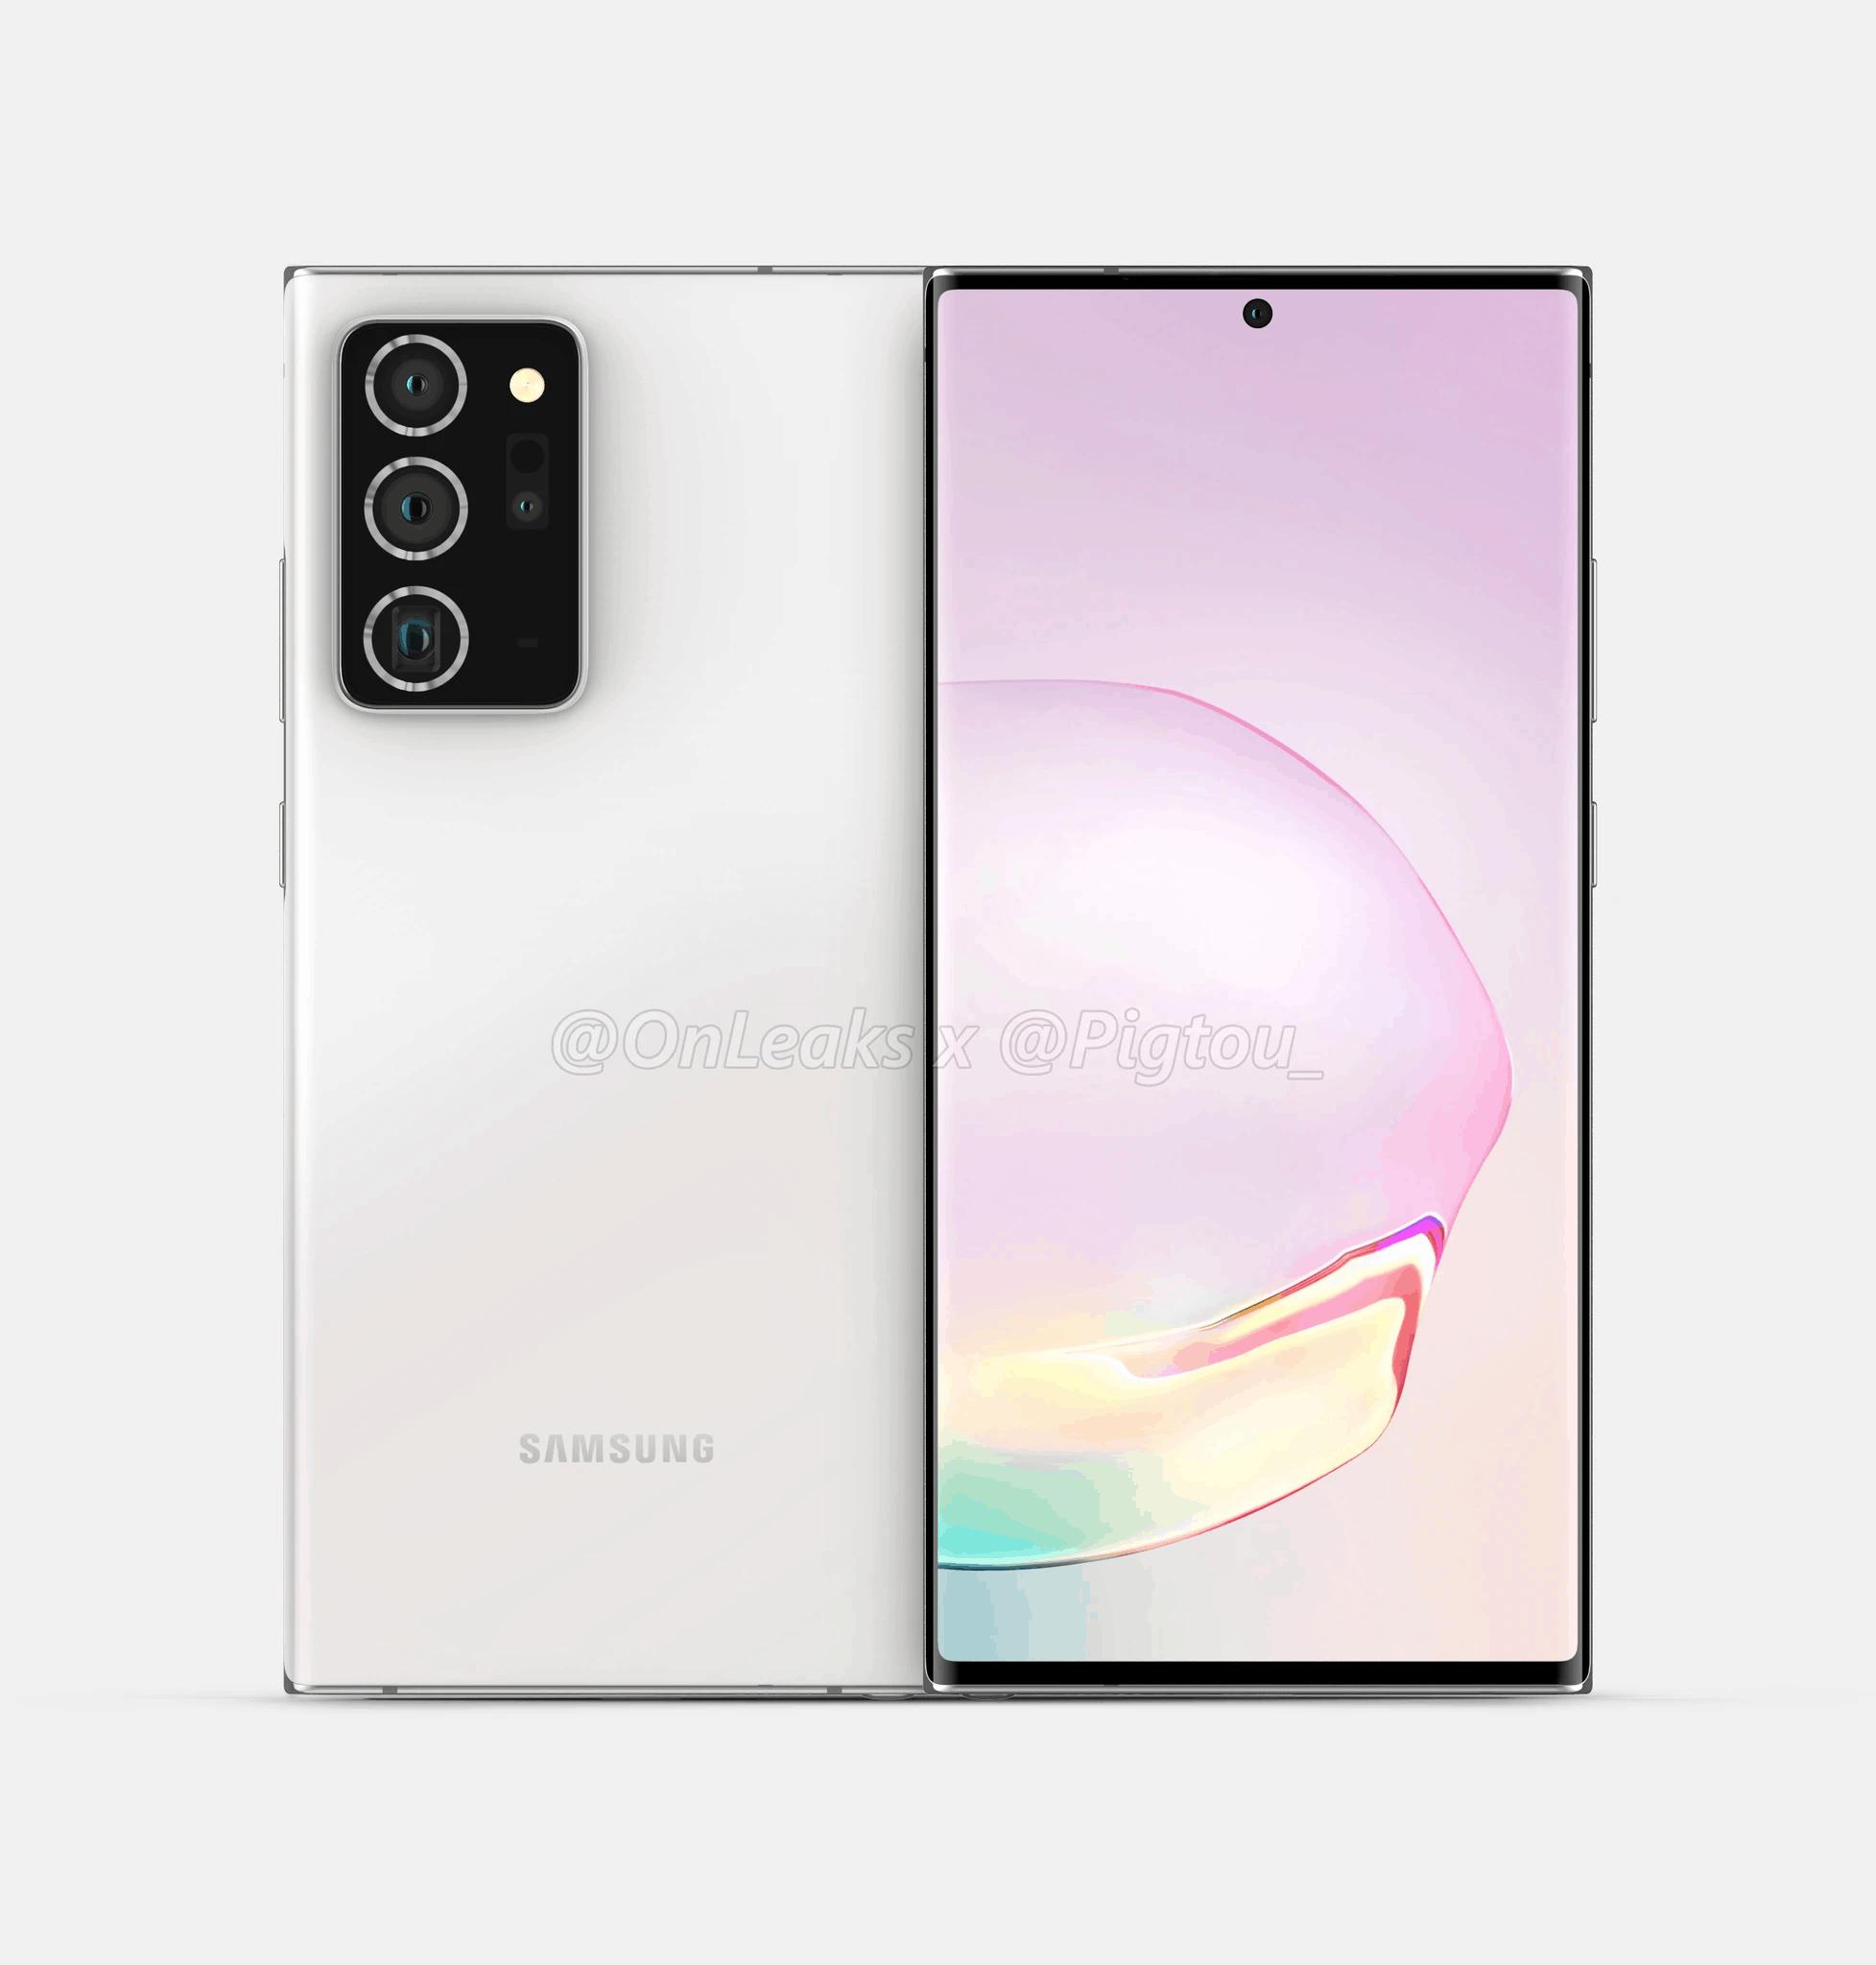 Samsung Galaxy Note 20 Plus render leak 2